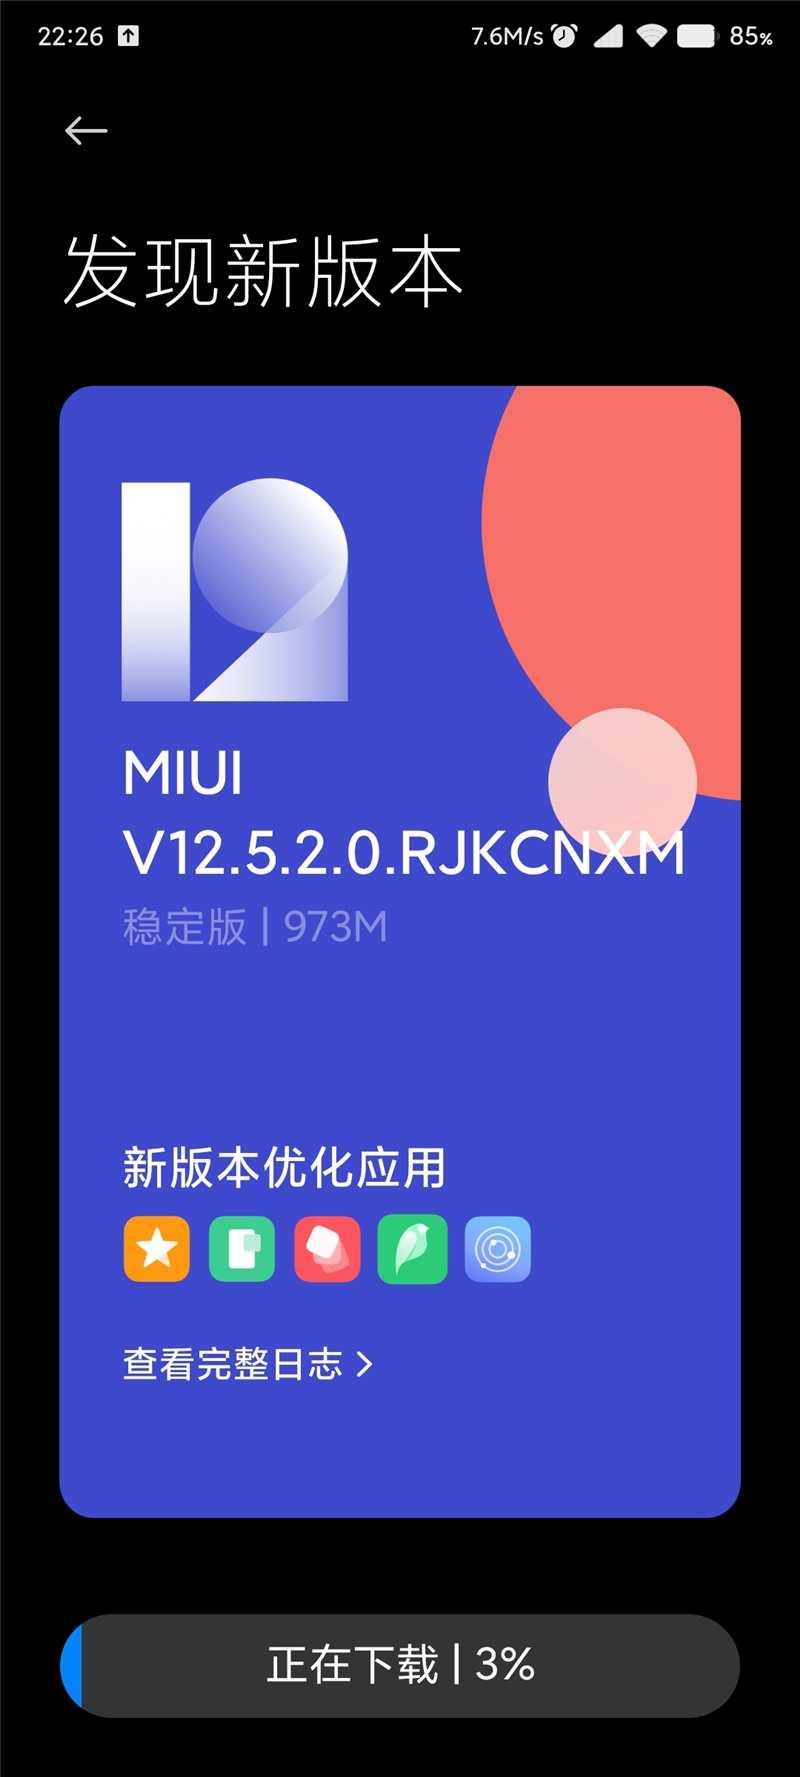 Redmi K30 Pro 已全量推送 MIUI 12.5 稳定版